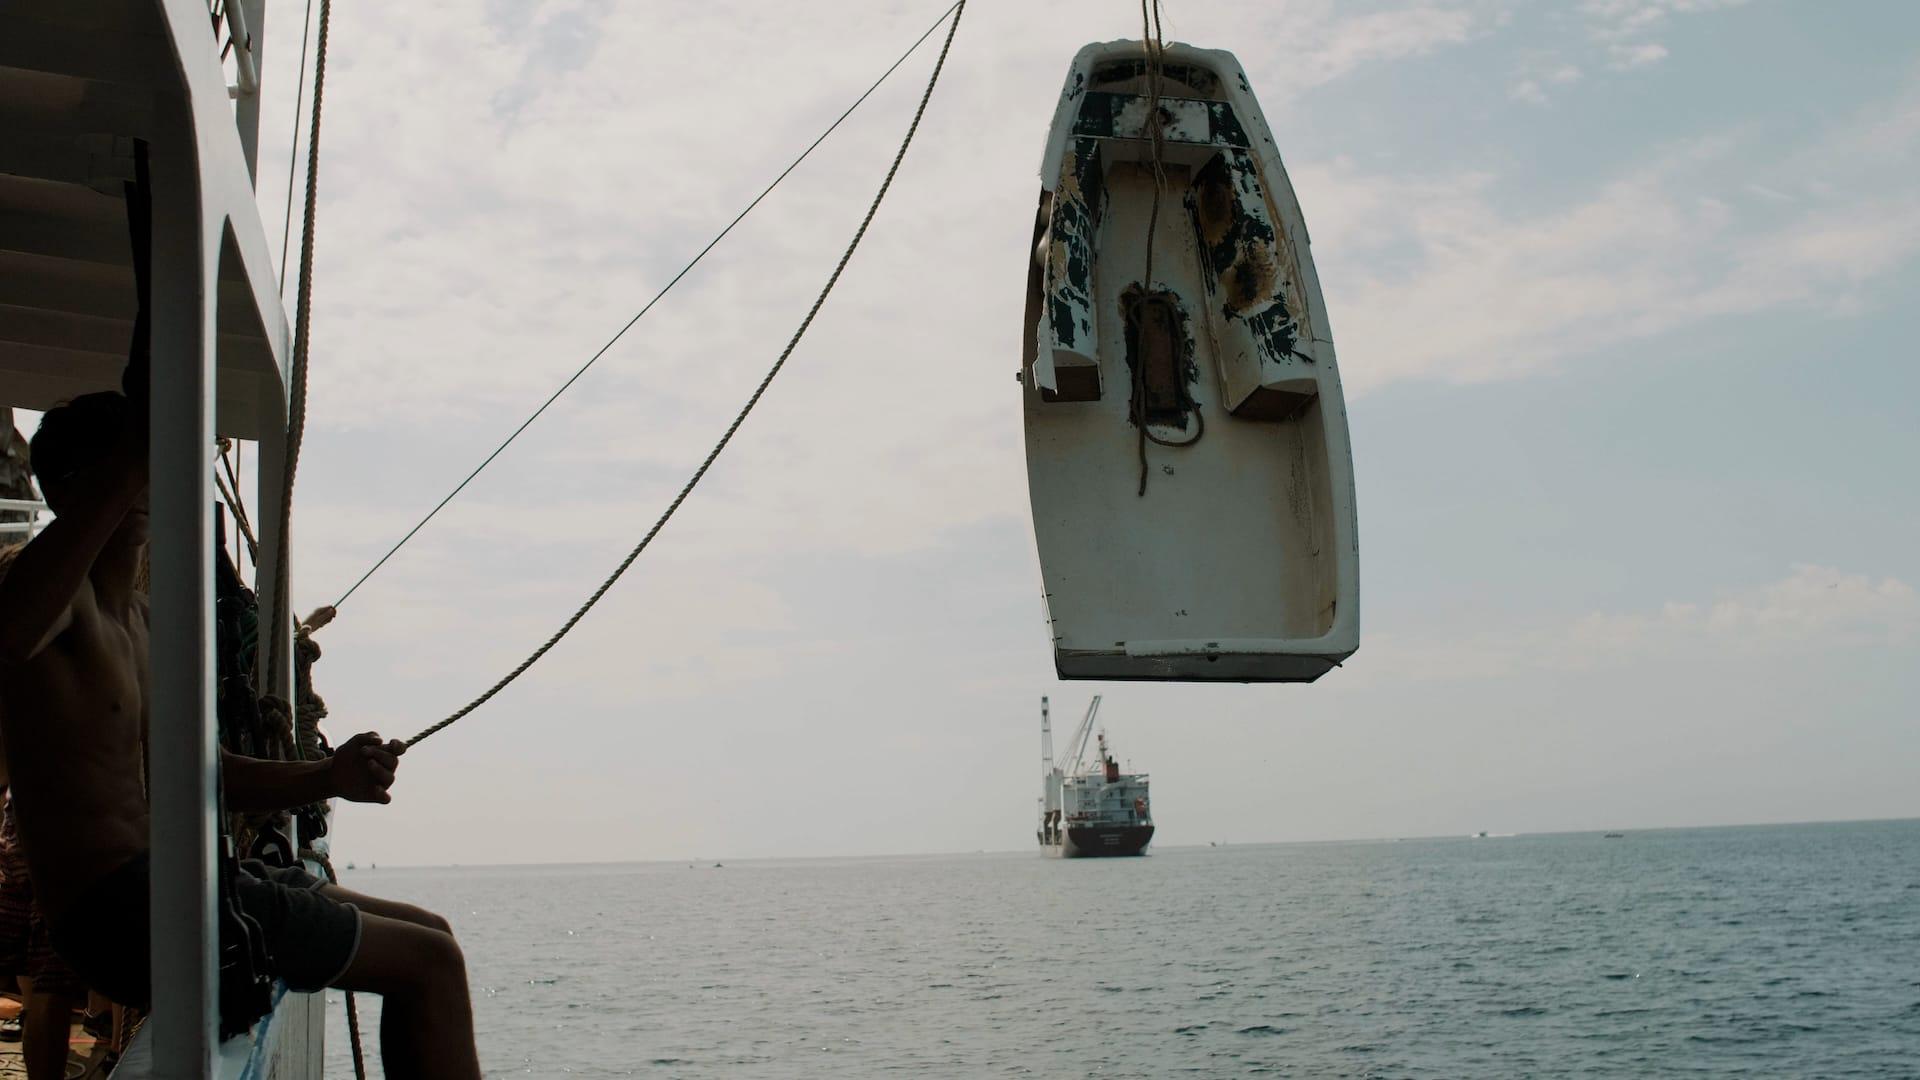 Pulizia fondali marini